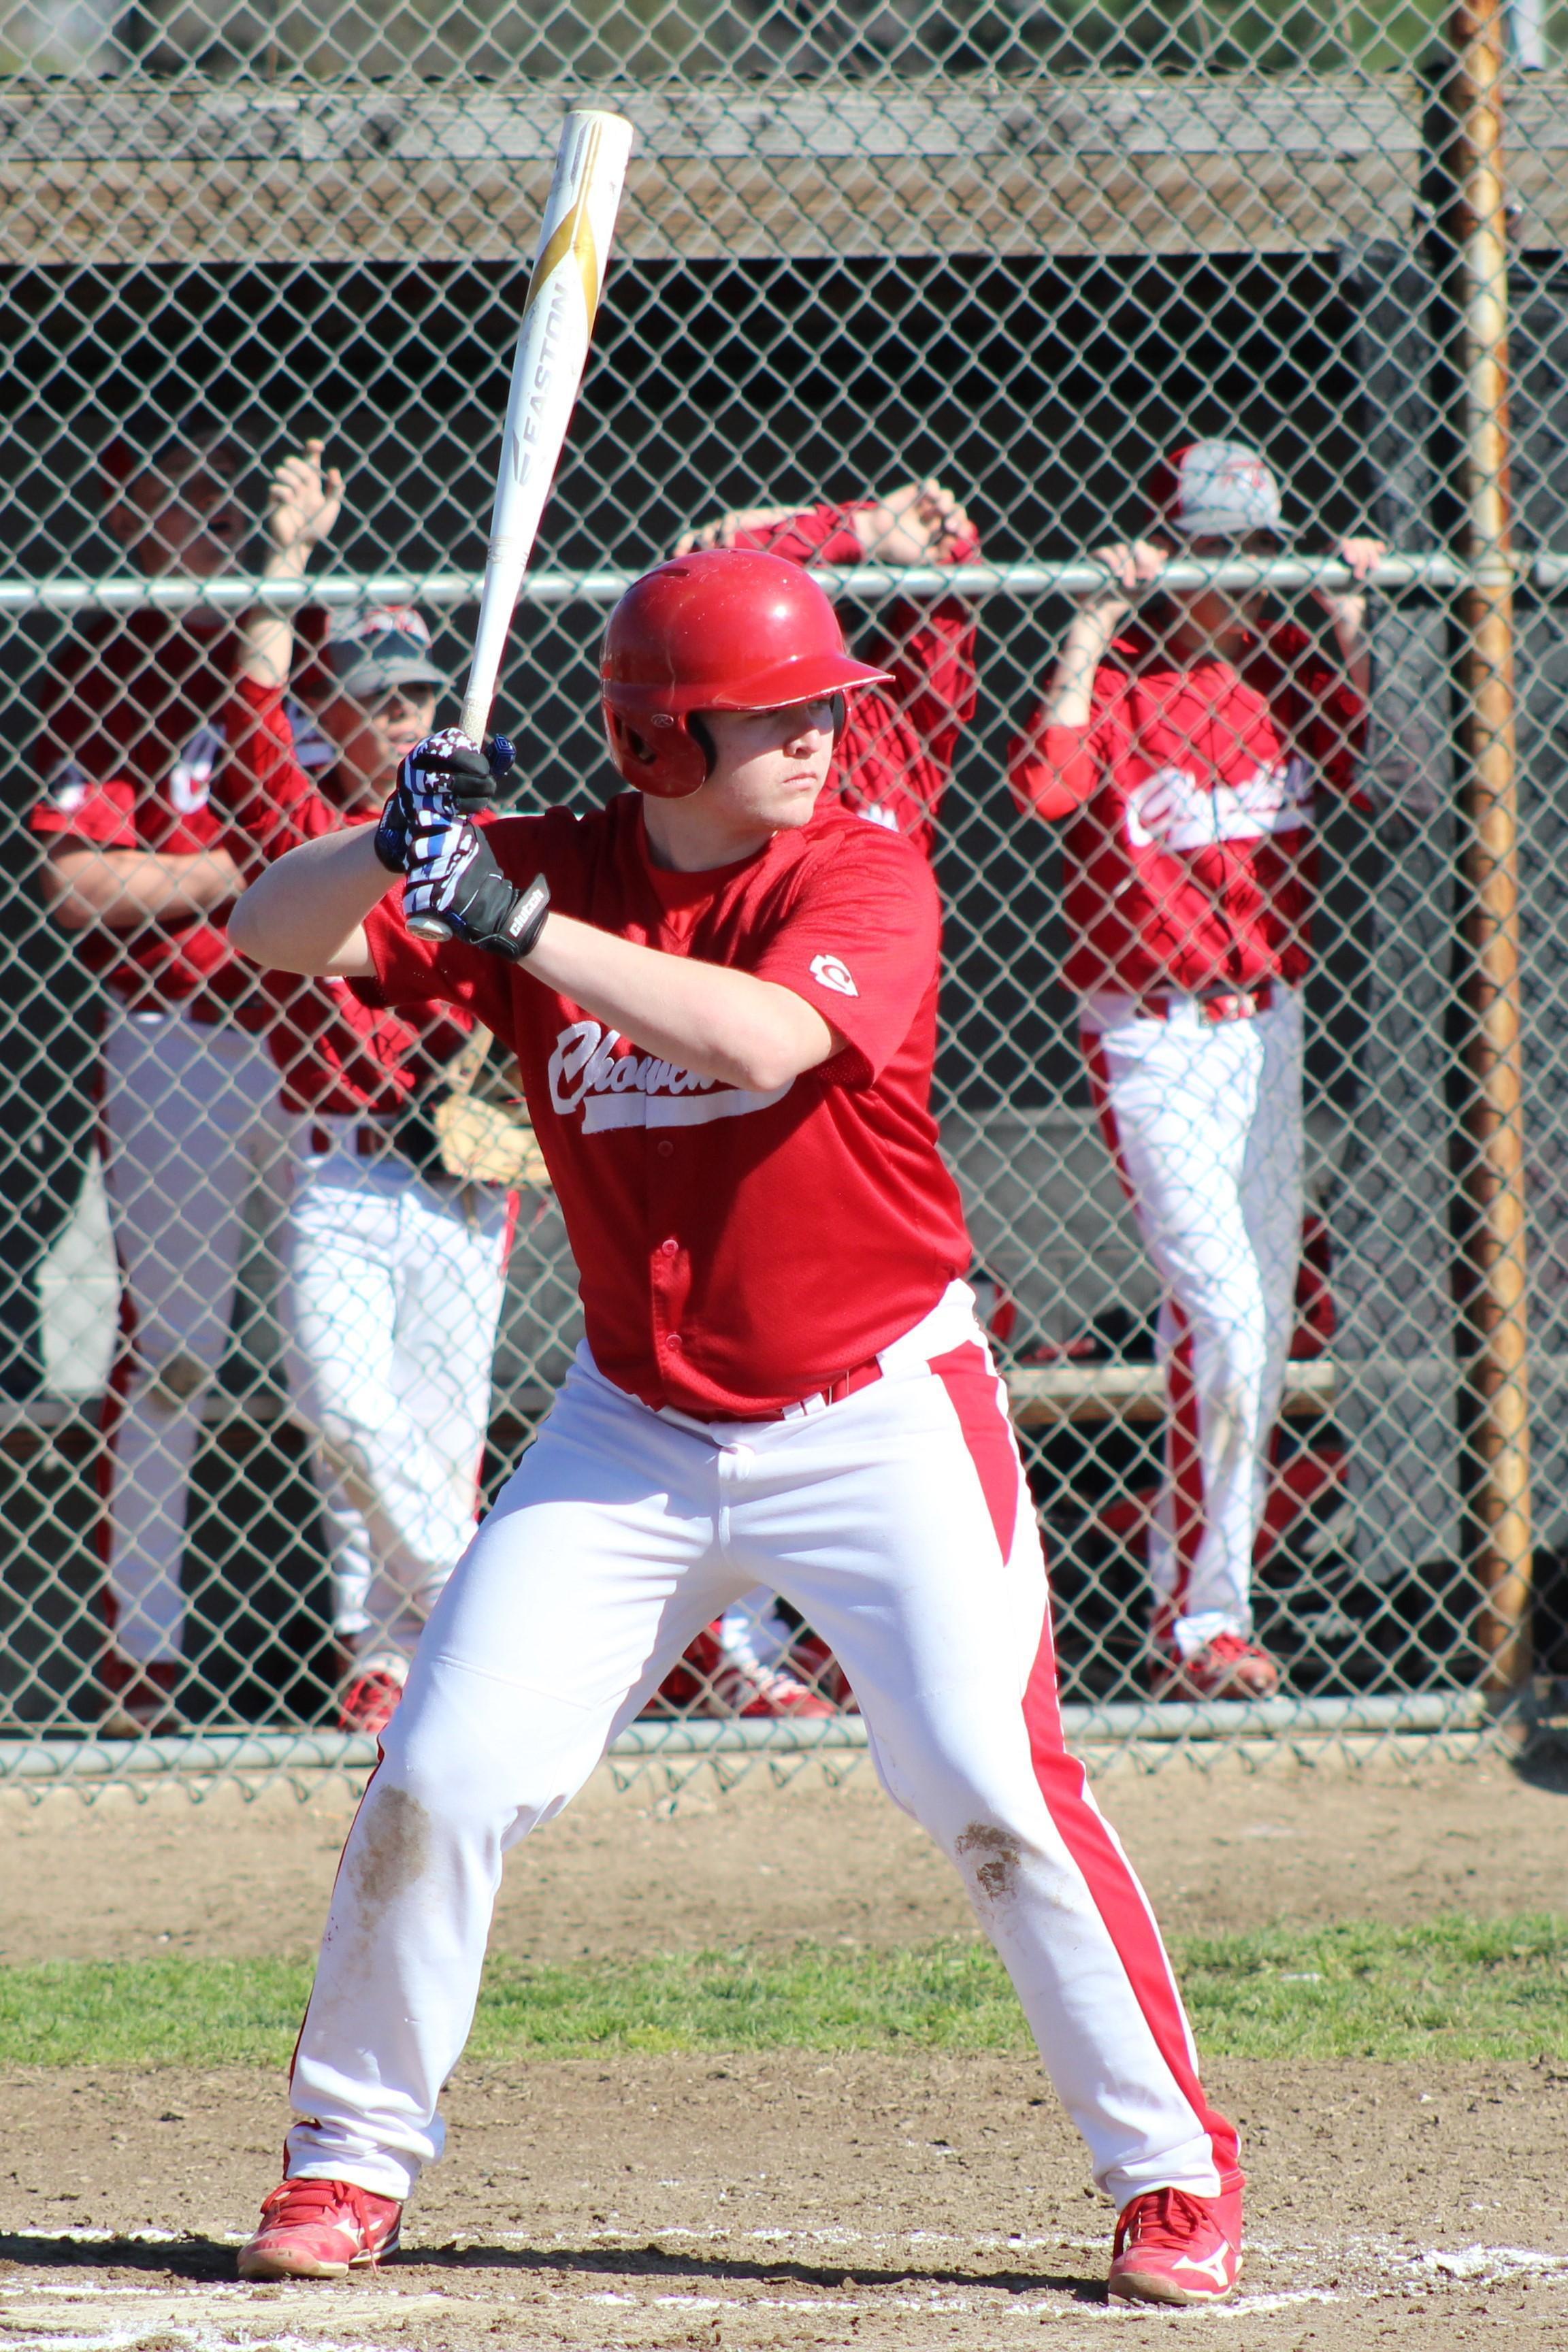 JV Baseball in action against Washington Union